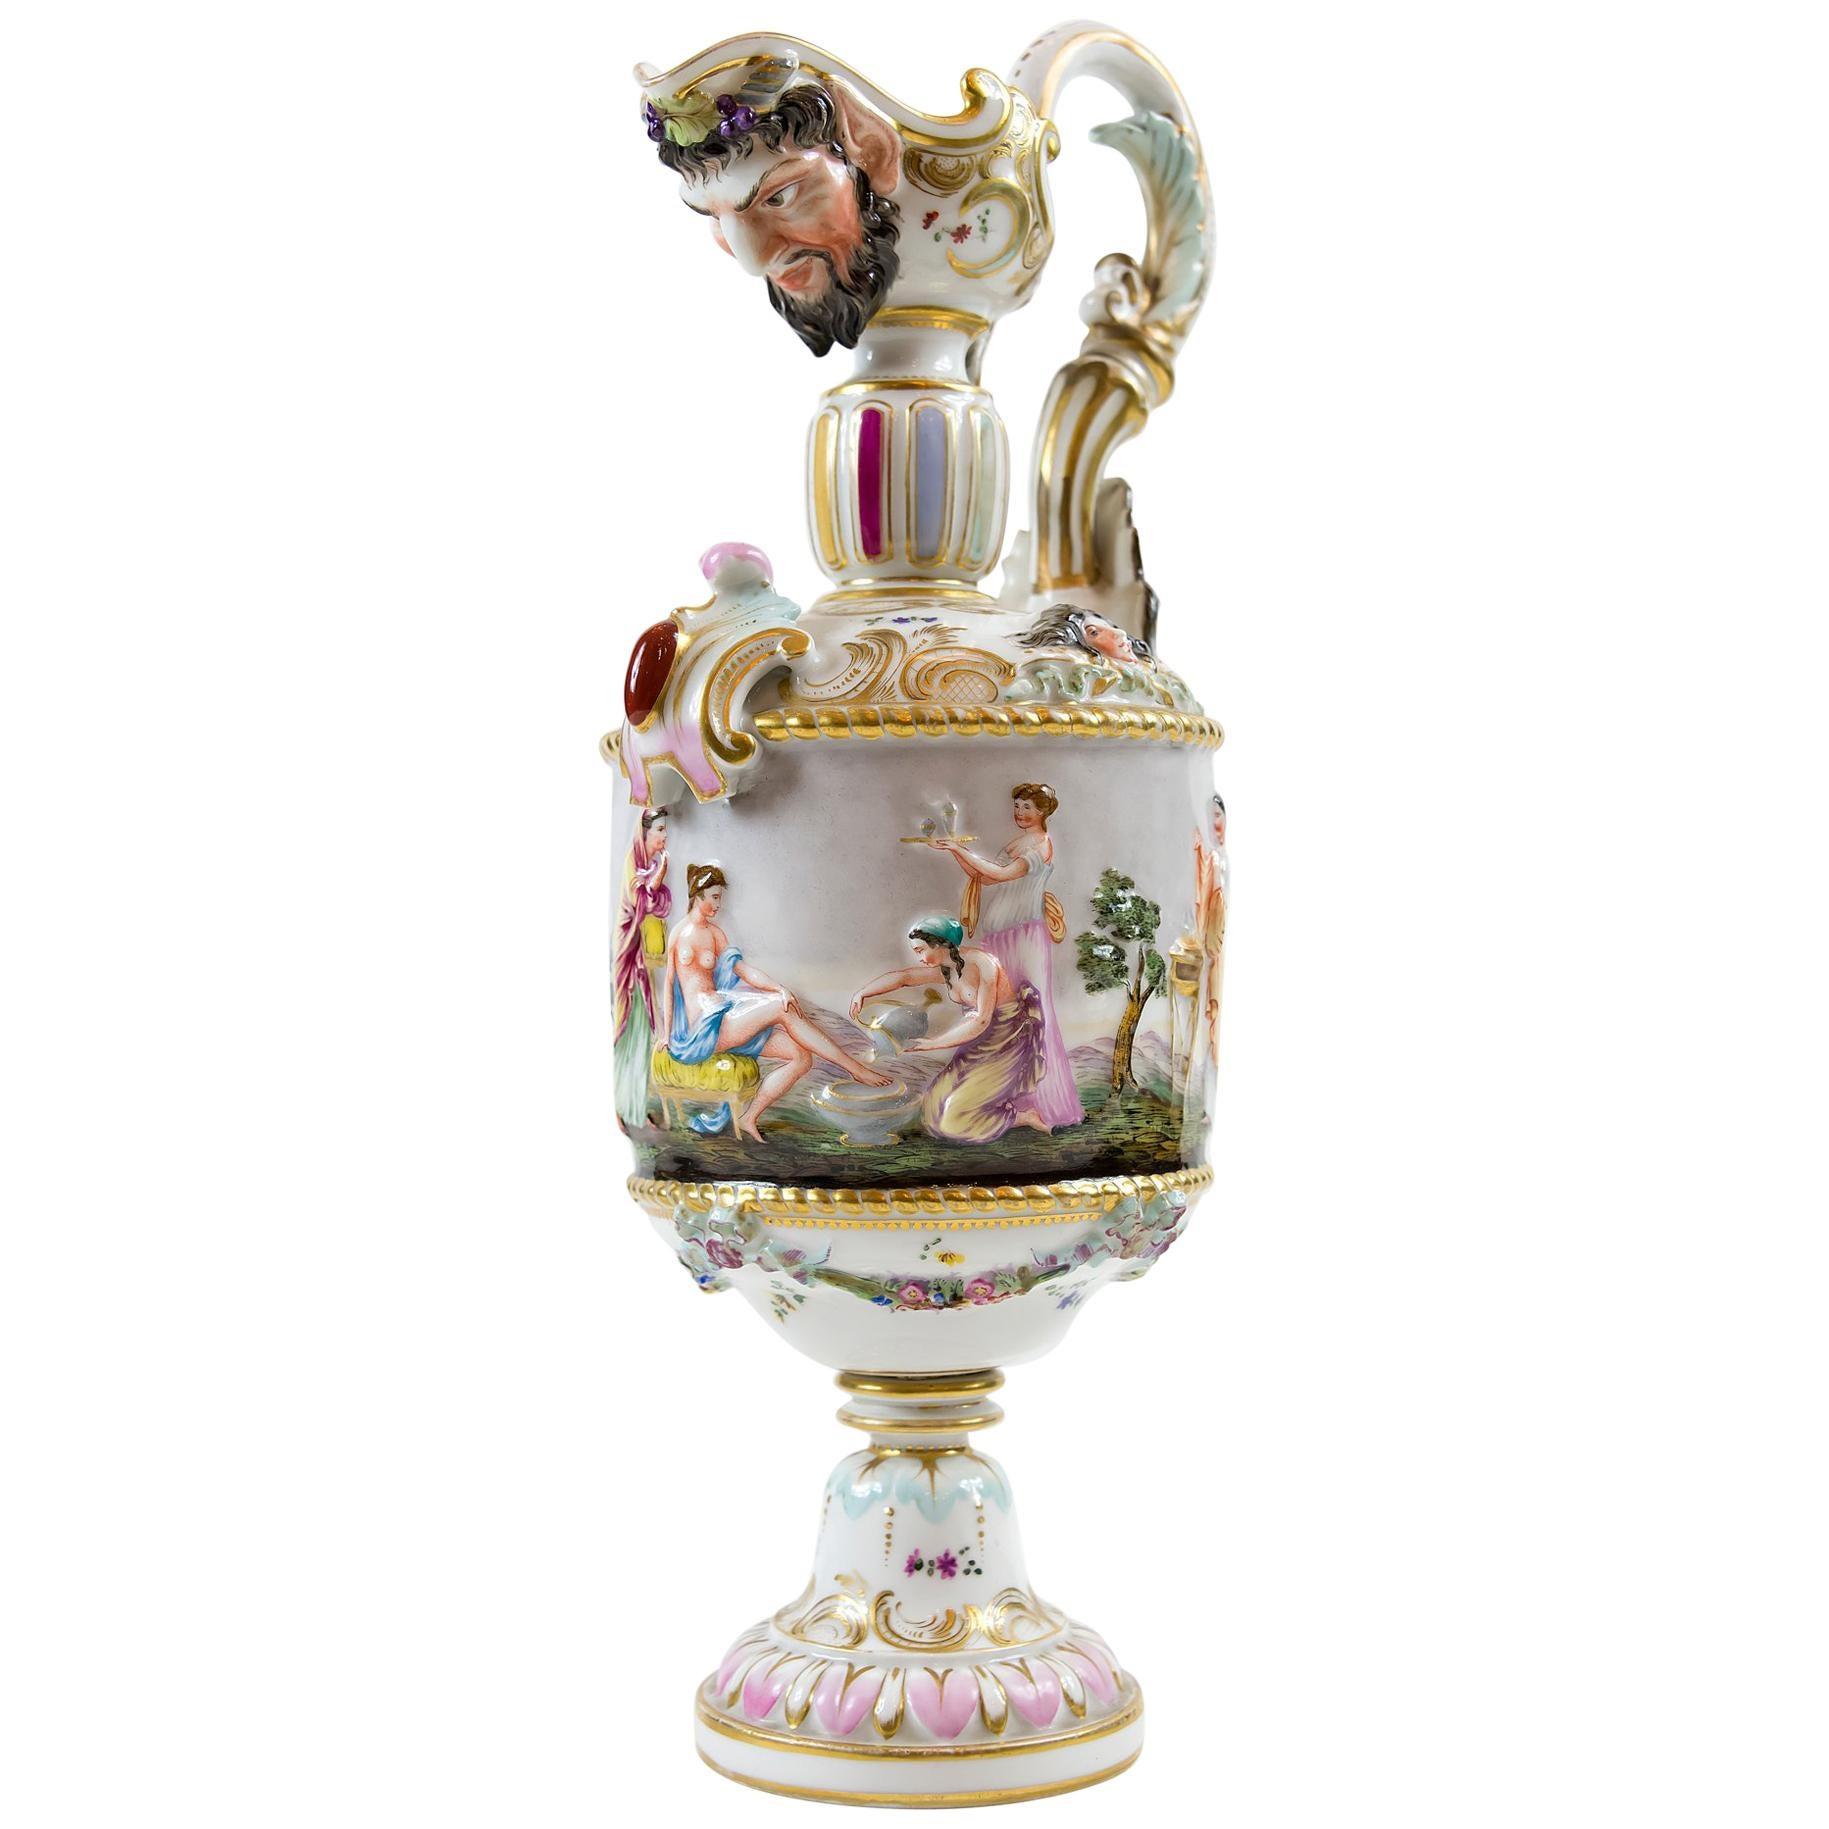 Antique Capodimonte Porcelain Pitcher, circa 1900